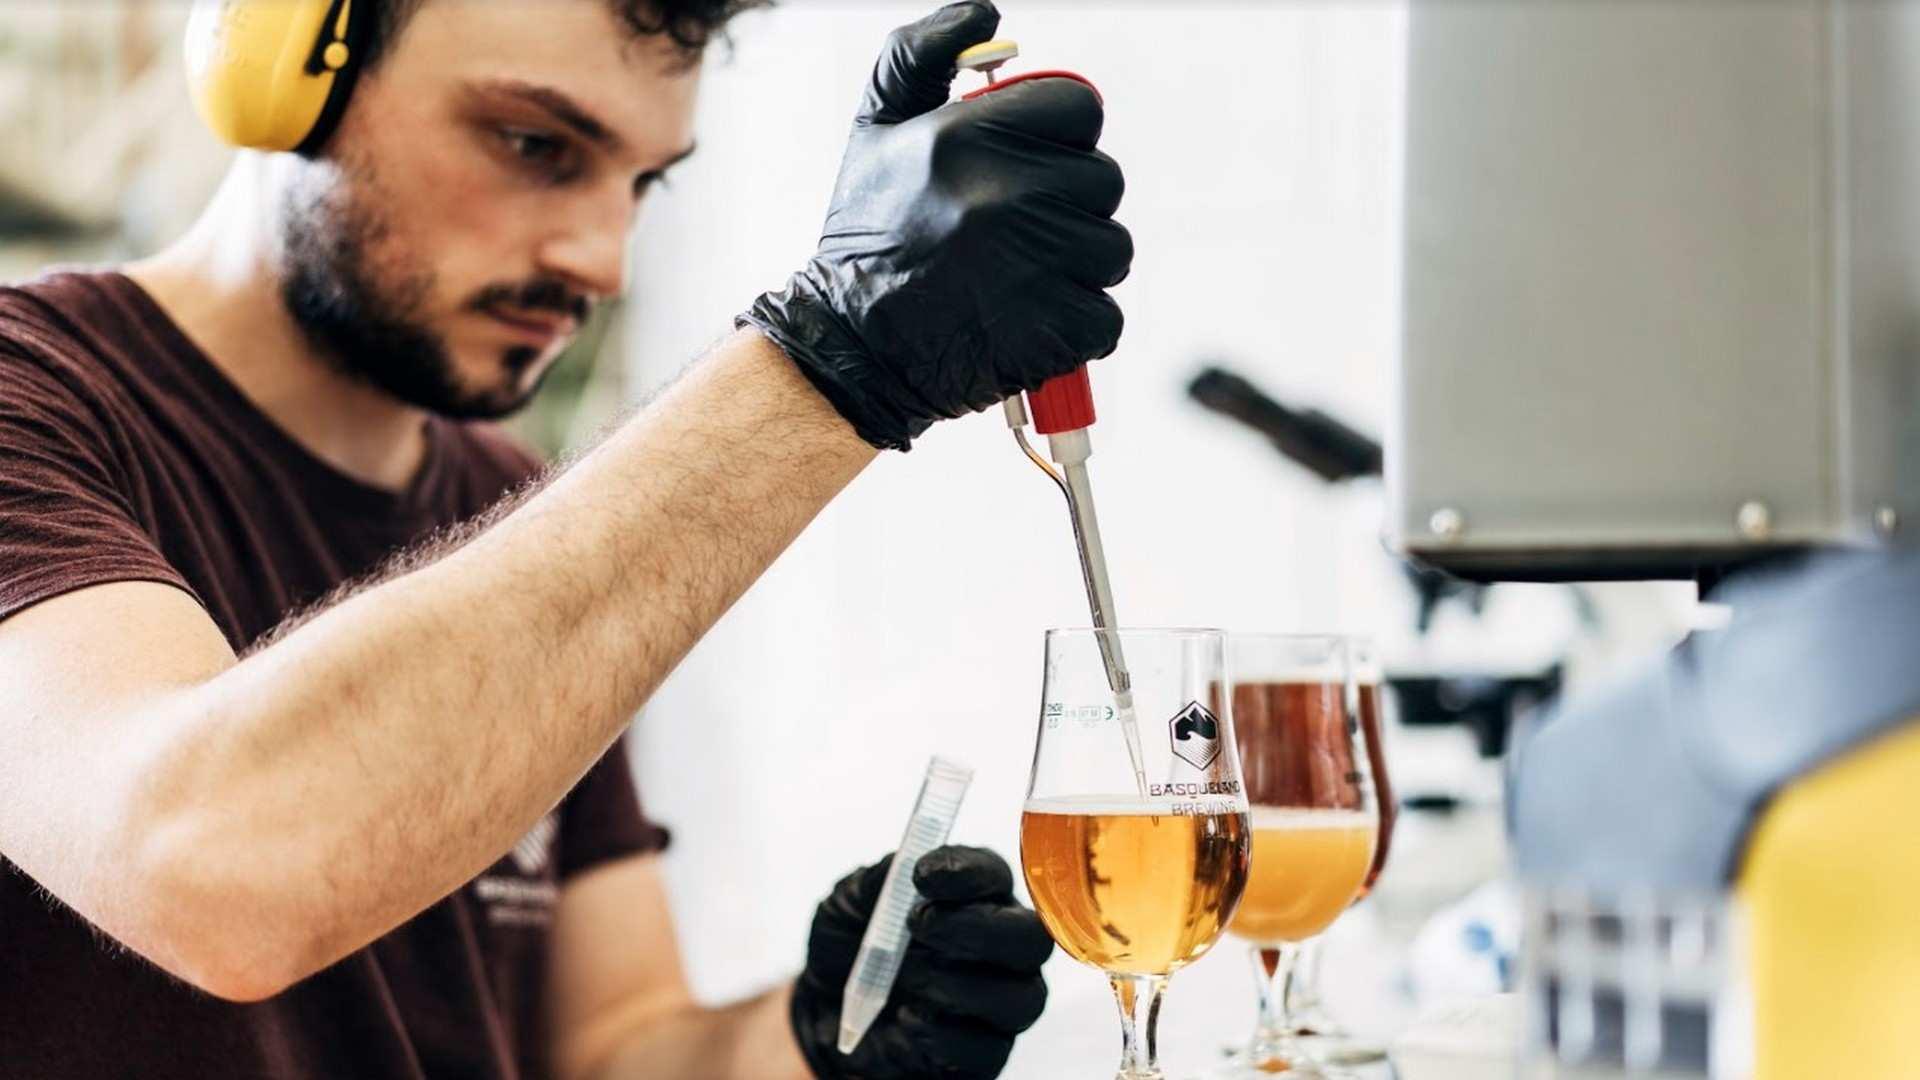 La cerveza artesana se cuela en la alta cocina vasca